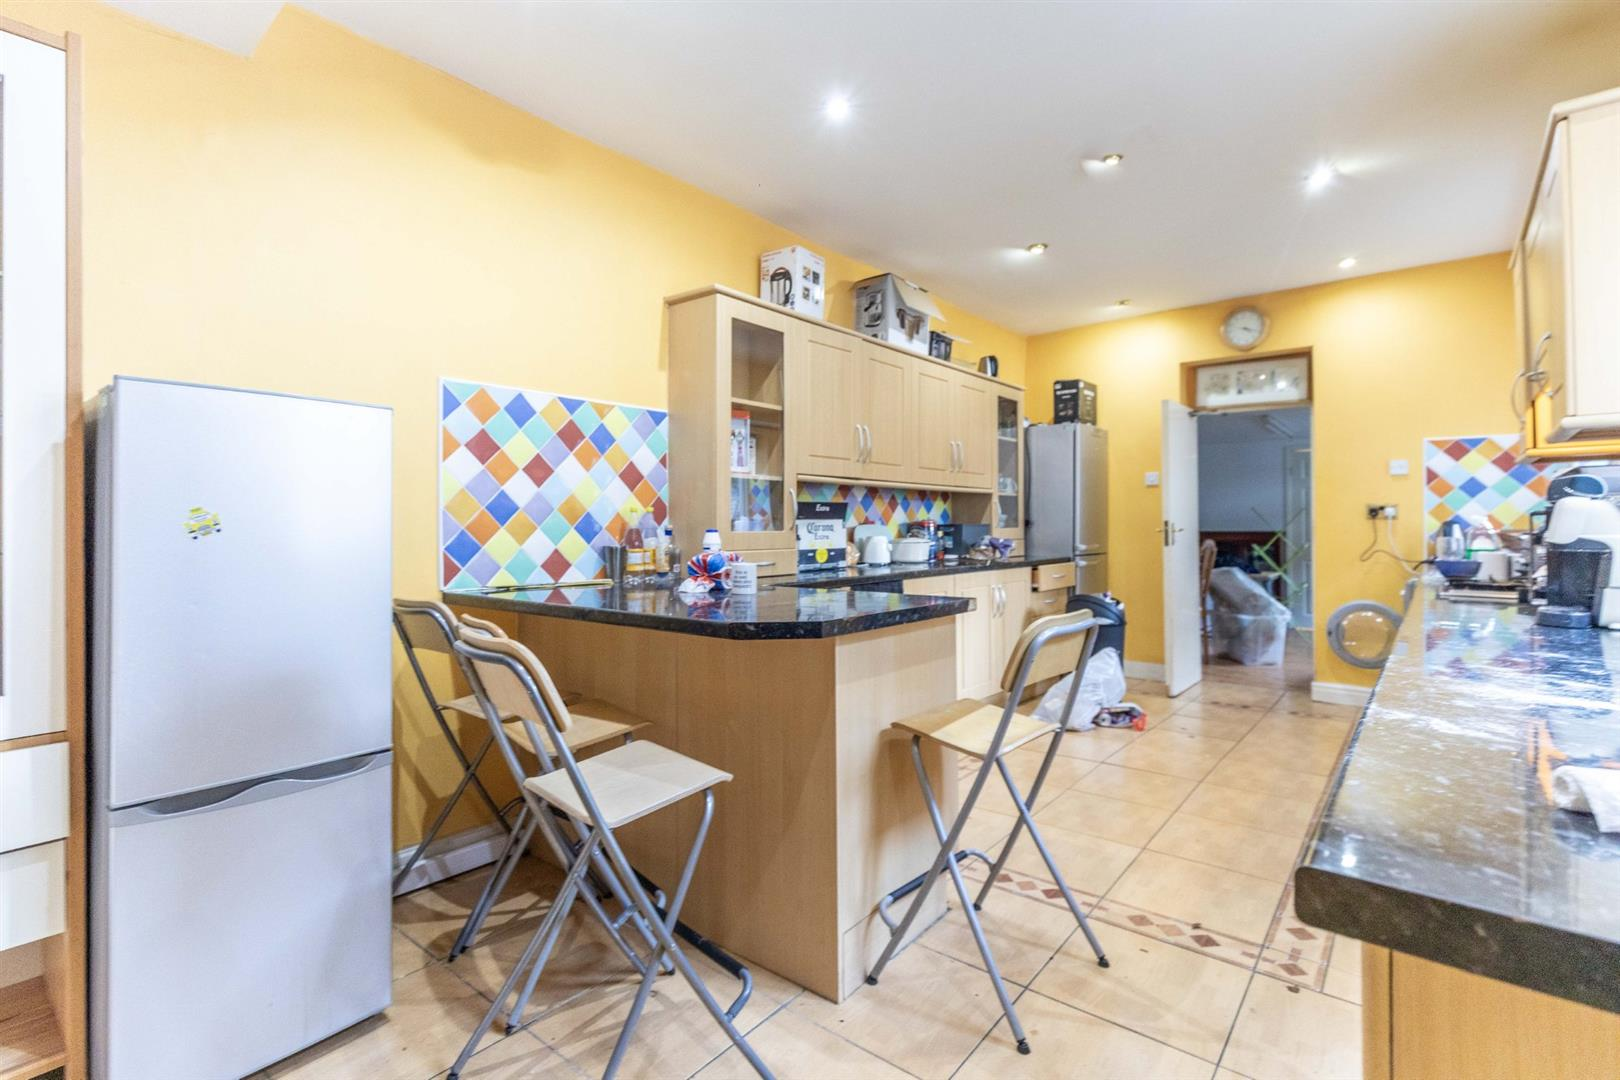 6 bed terraced house to rent in Newcastle Upon Tyne, NE2 2QA, NE2